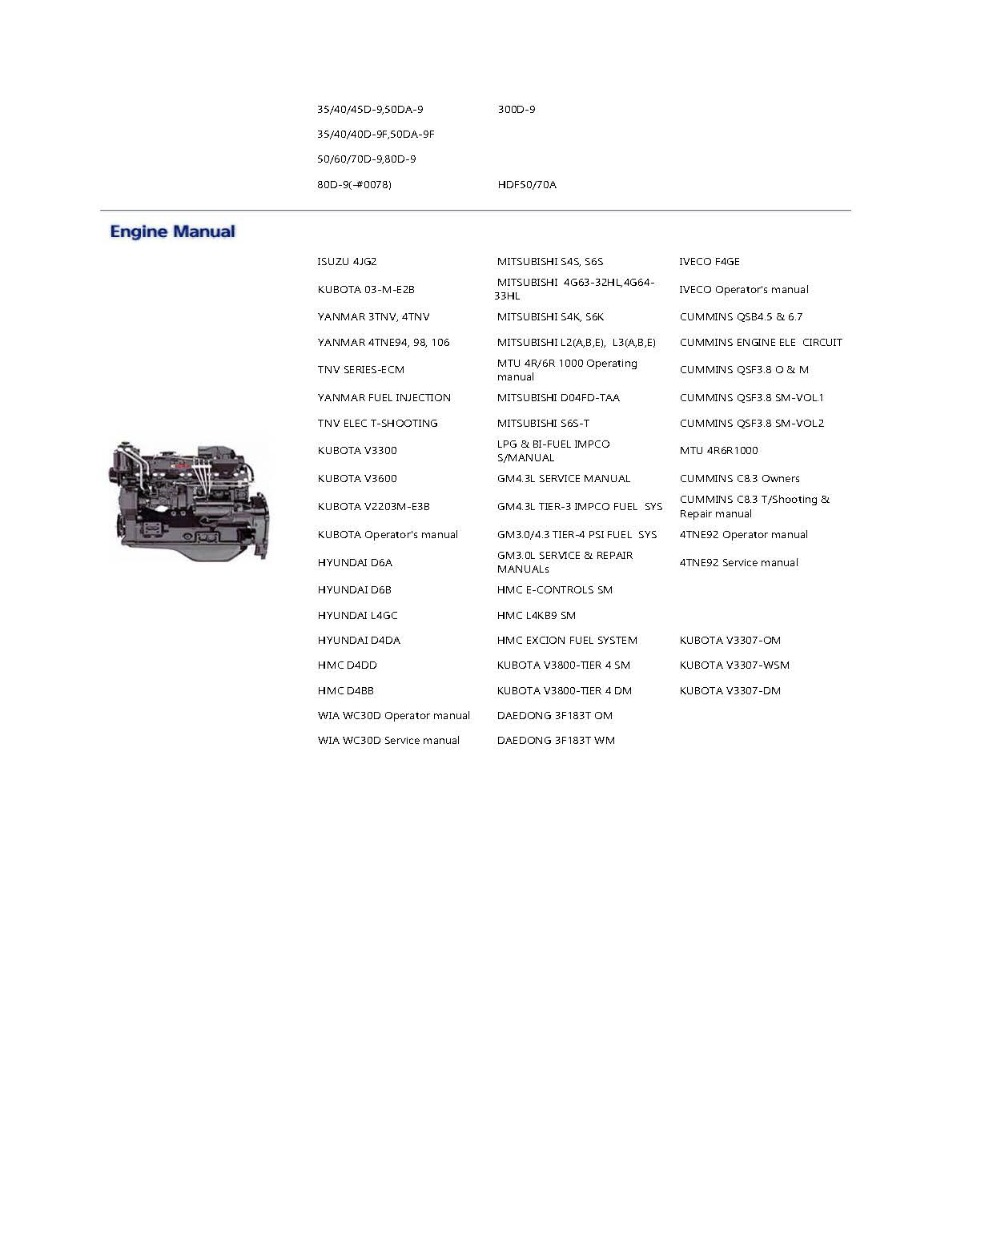 x25xe service manual